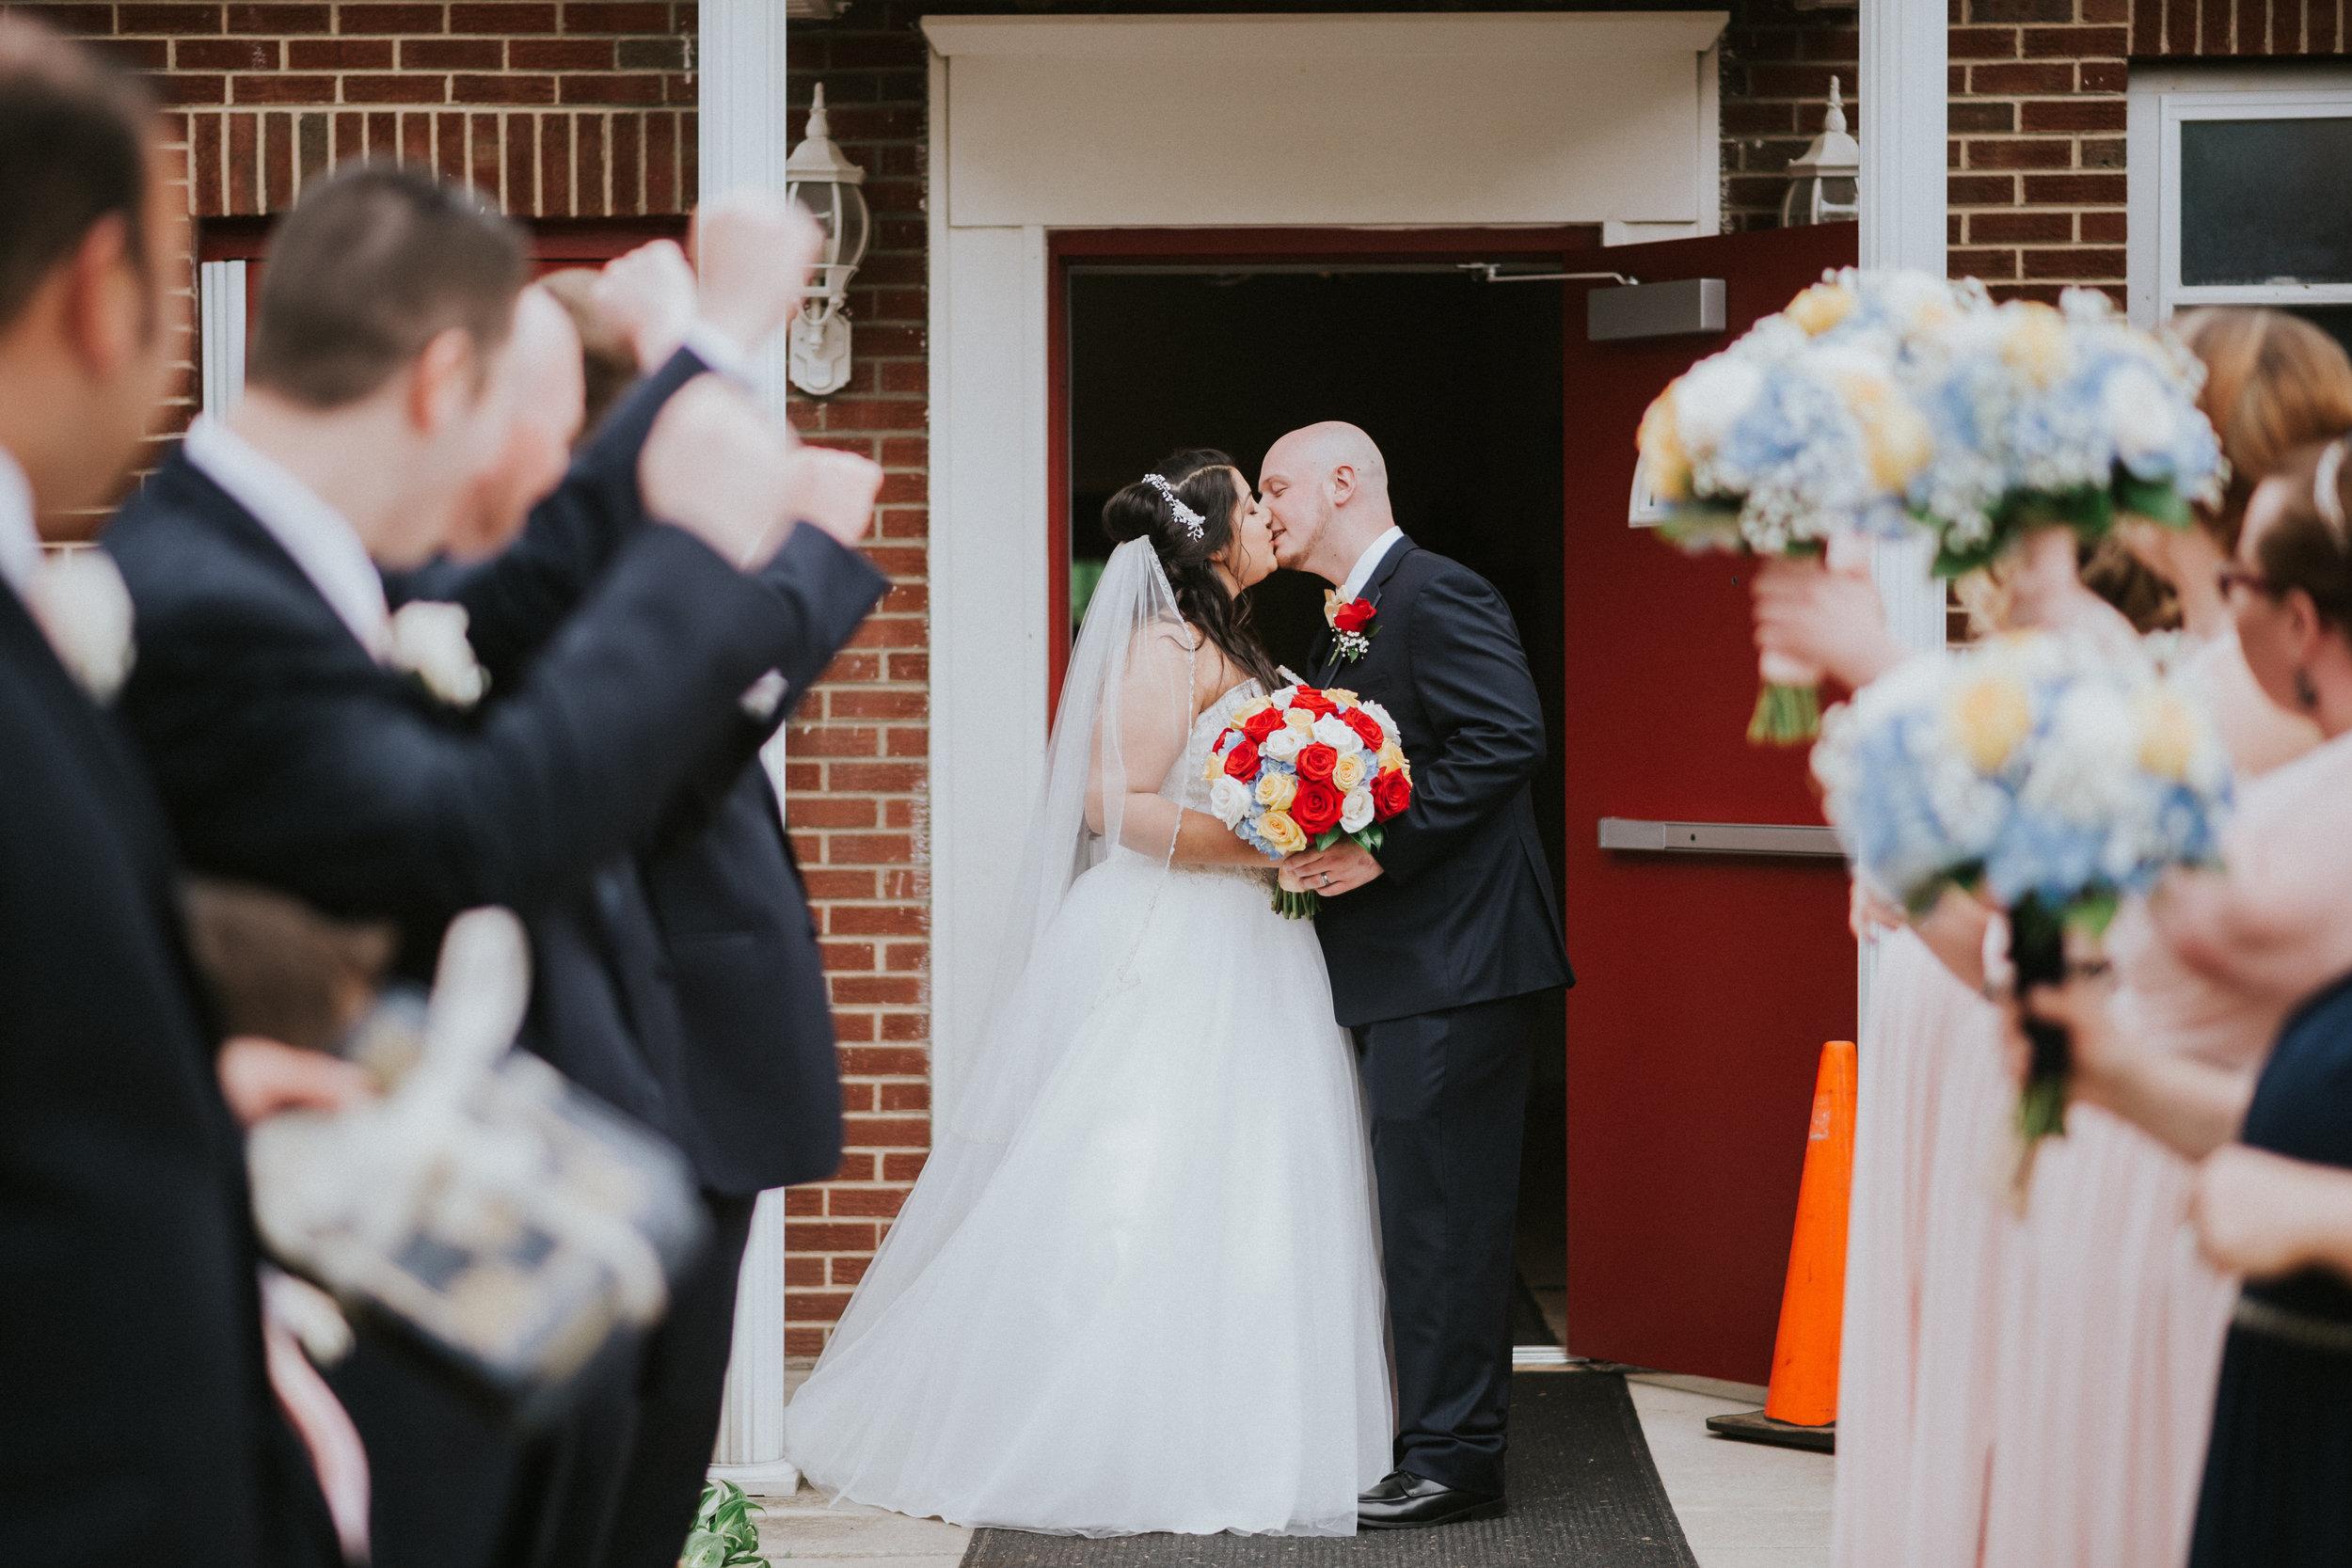 Barclay-Farmstead-Wedding-Rosa-and-Mike-330.jpg